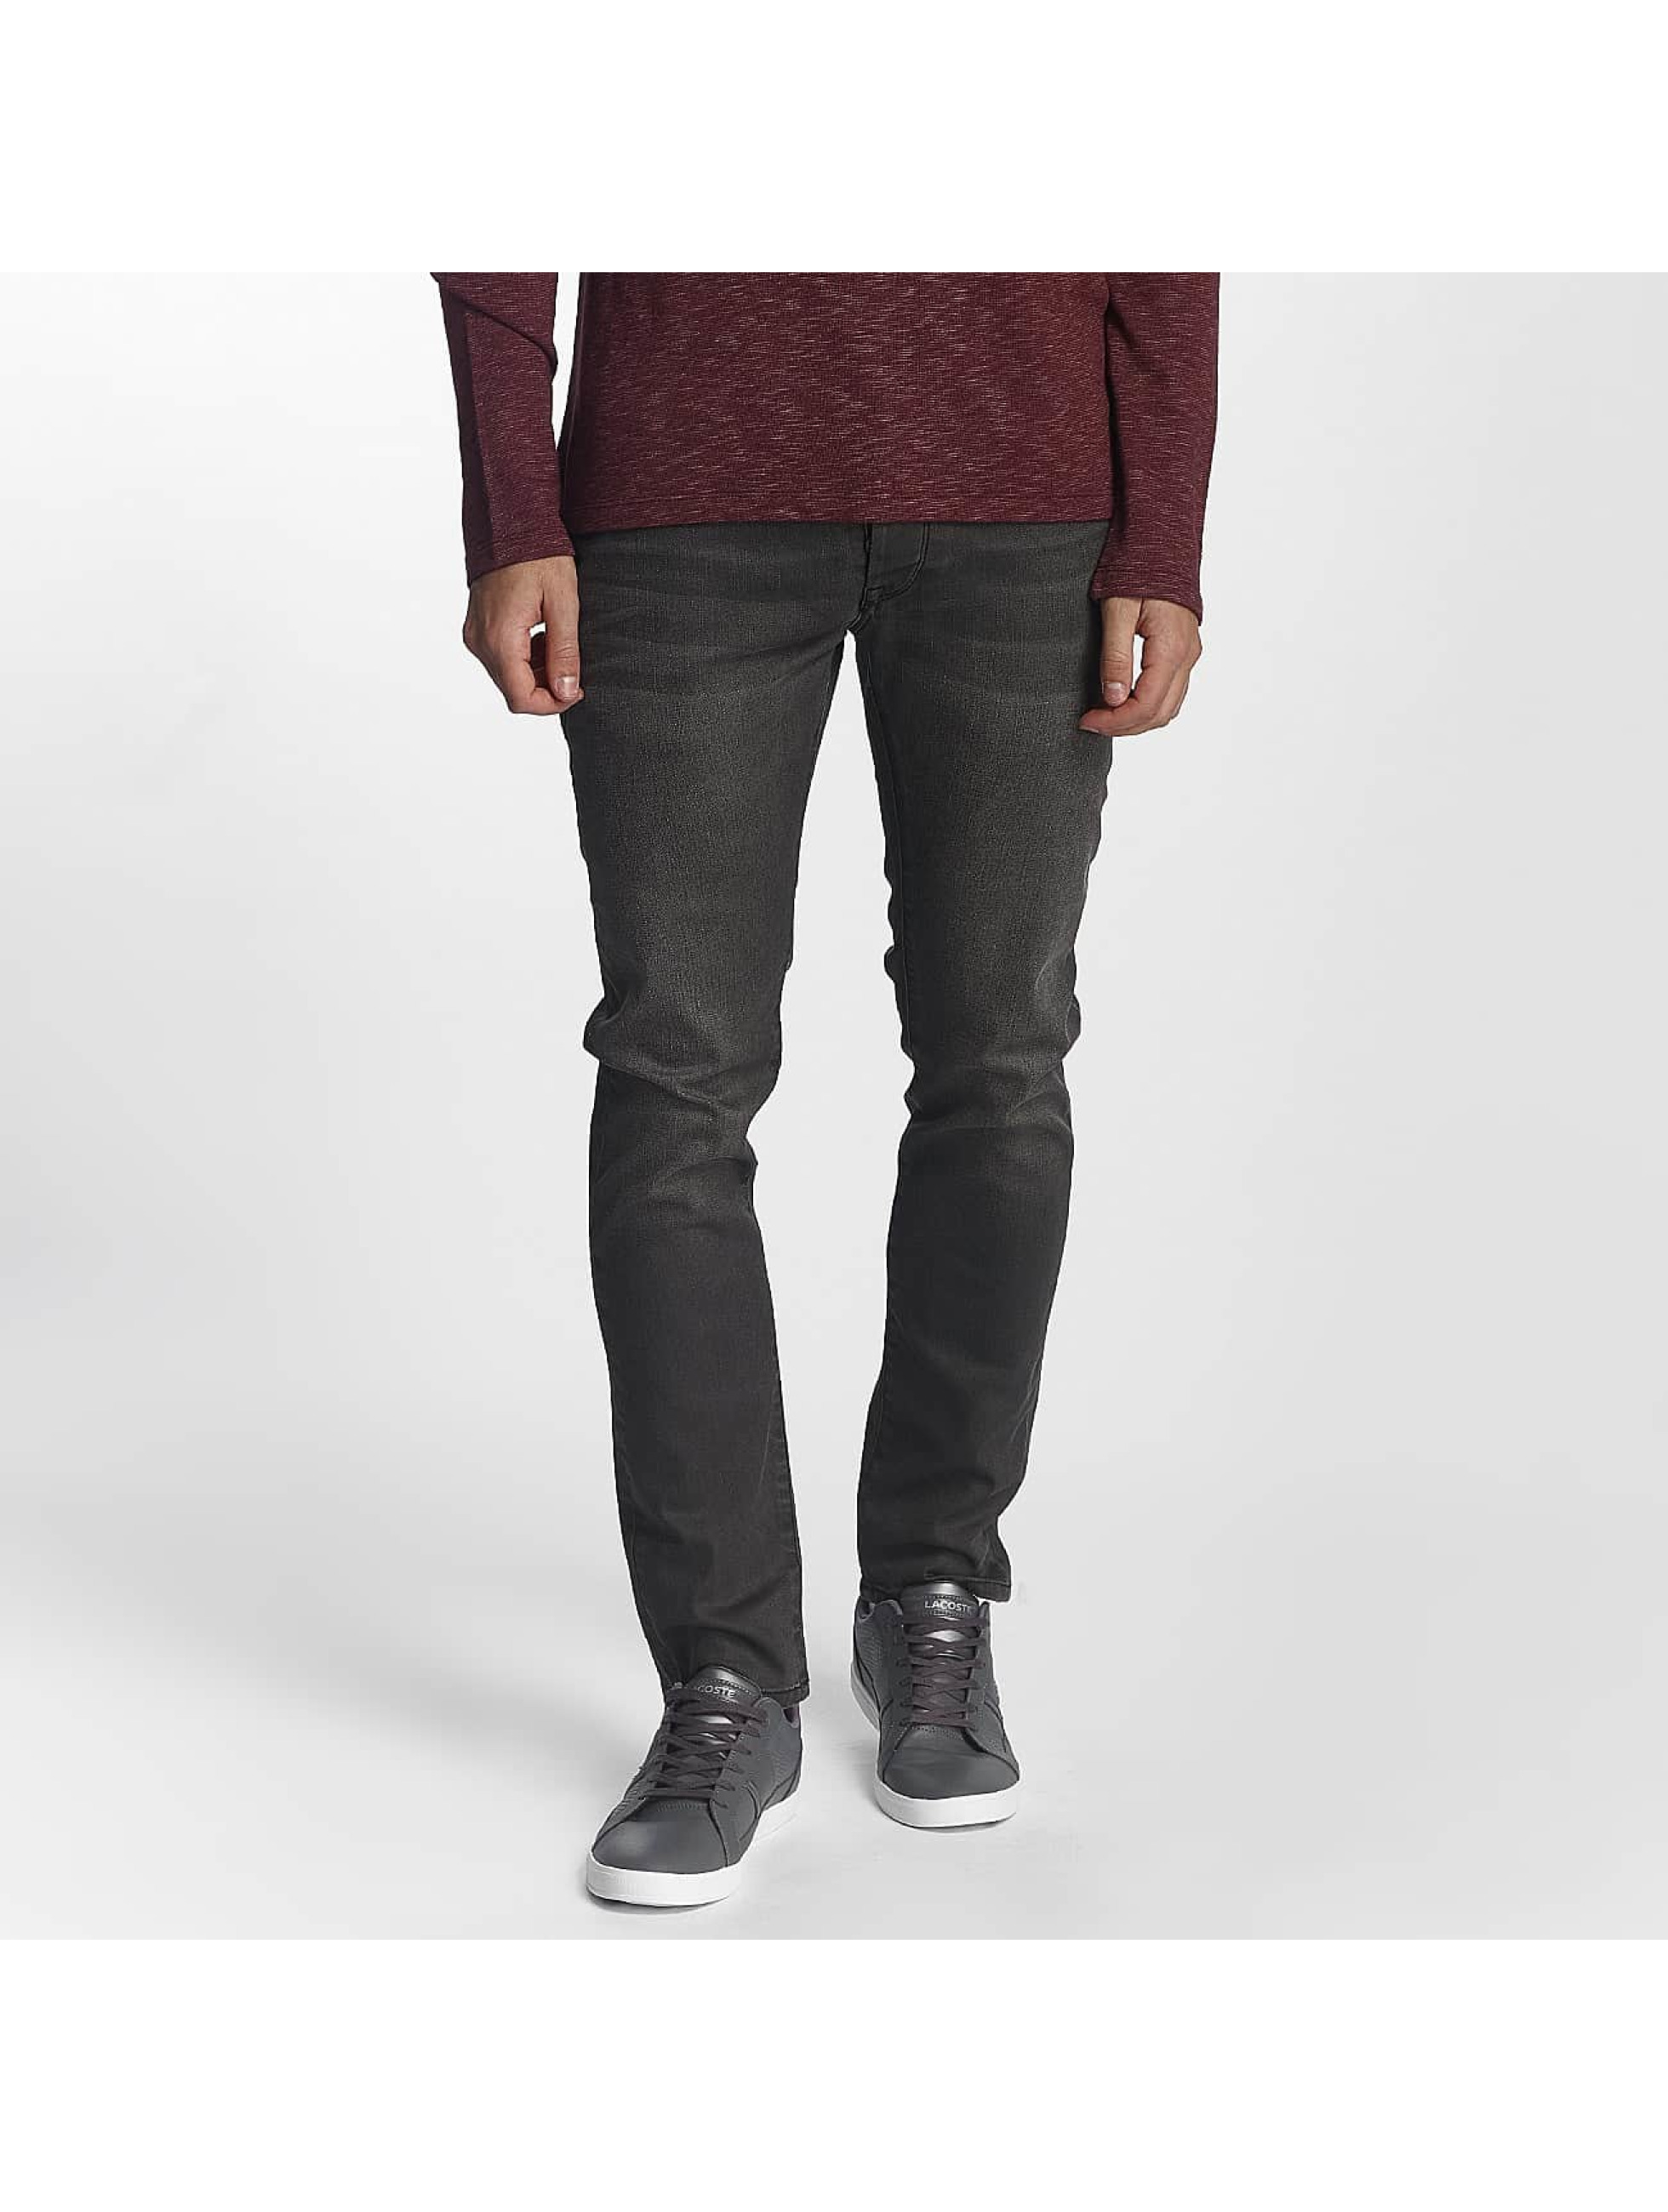 Mavi Jeans Männer Skinny Jeans Yves in grau